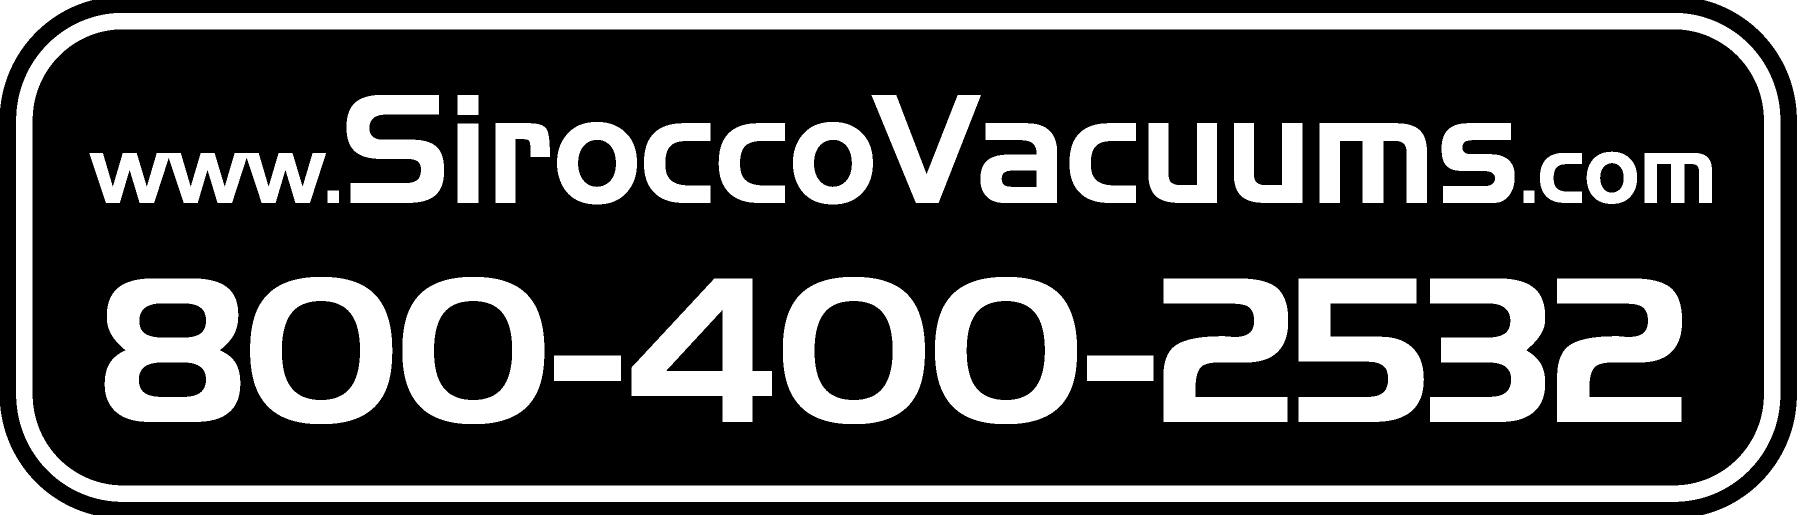 Sirocco Vacuums